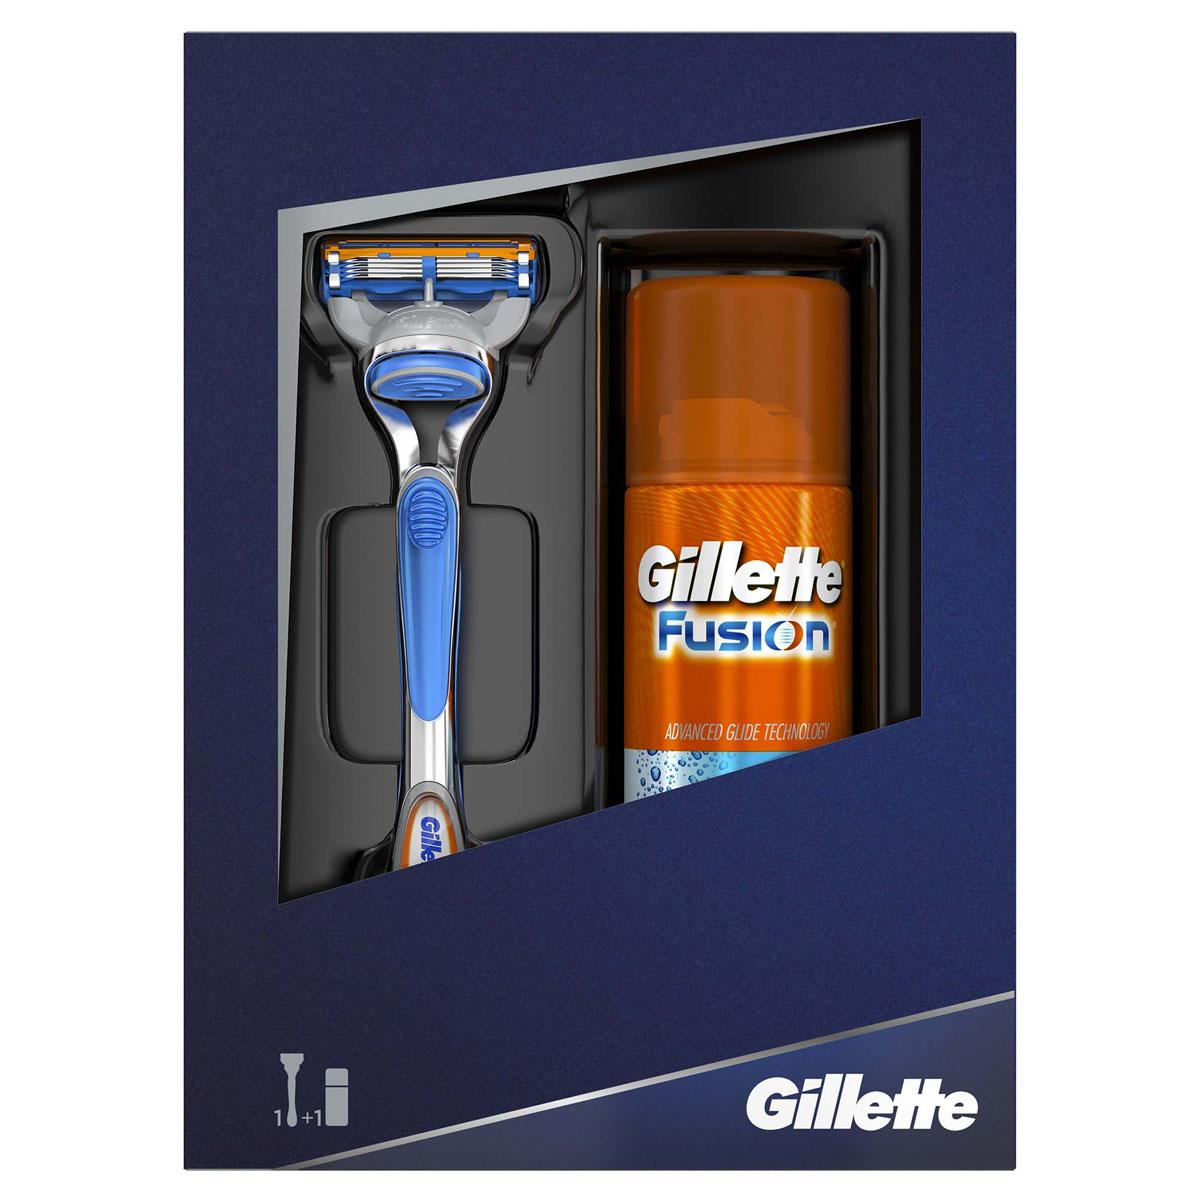 Gillette Подарочный набор Fusion: (Бритва Fusion + Гель для бритья Fusion HydraGel)